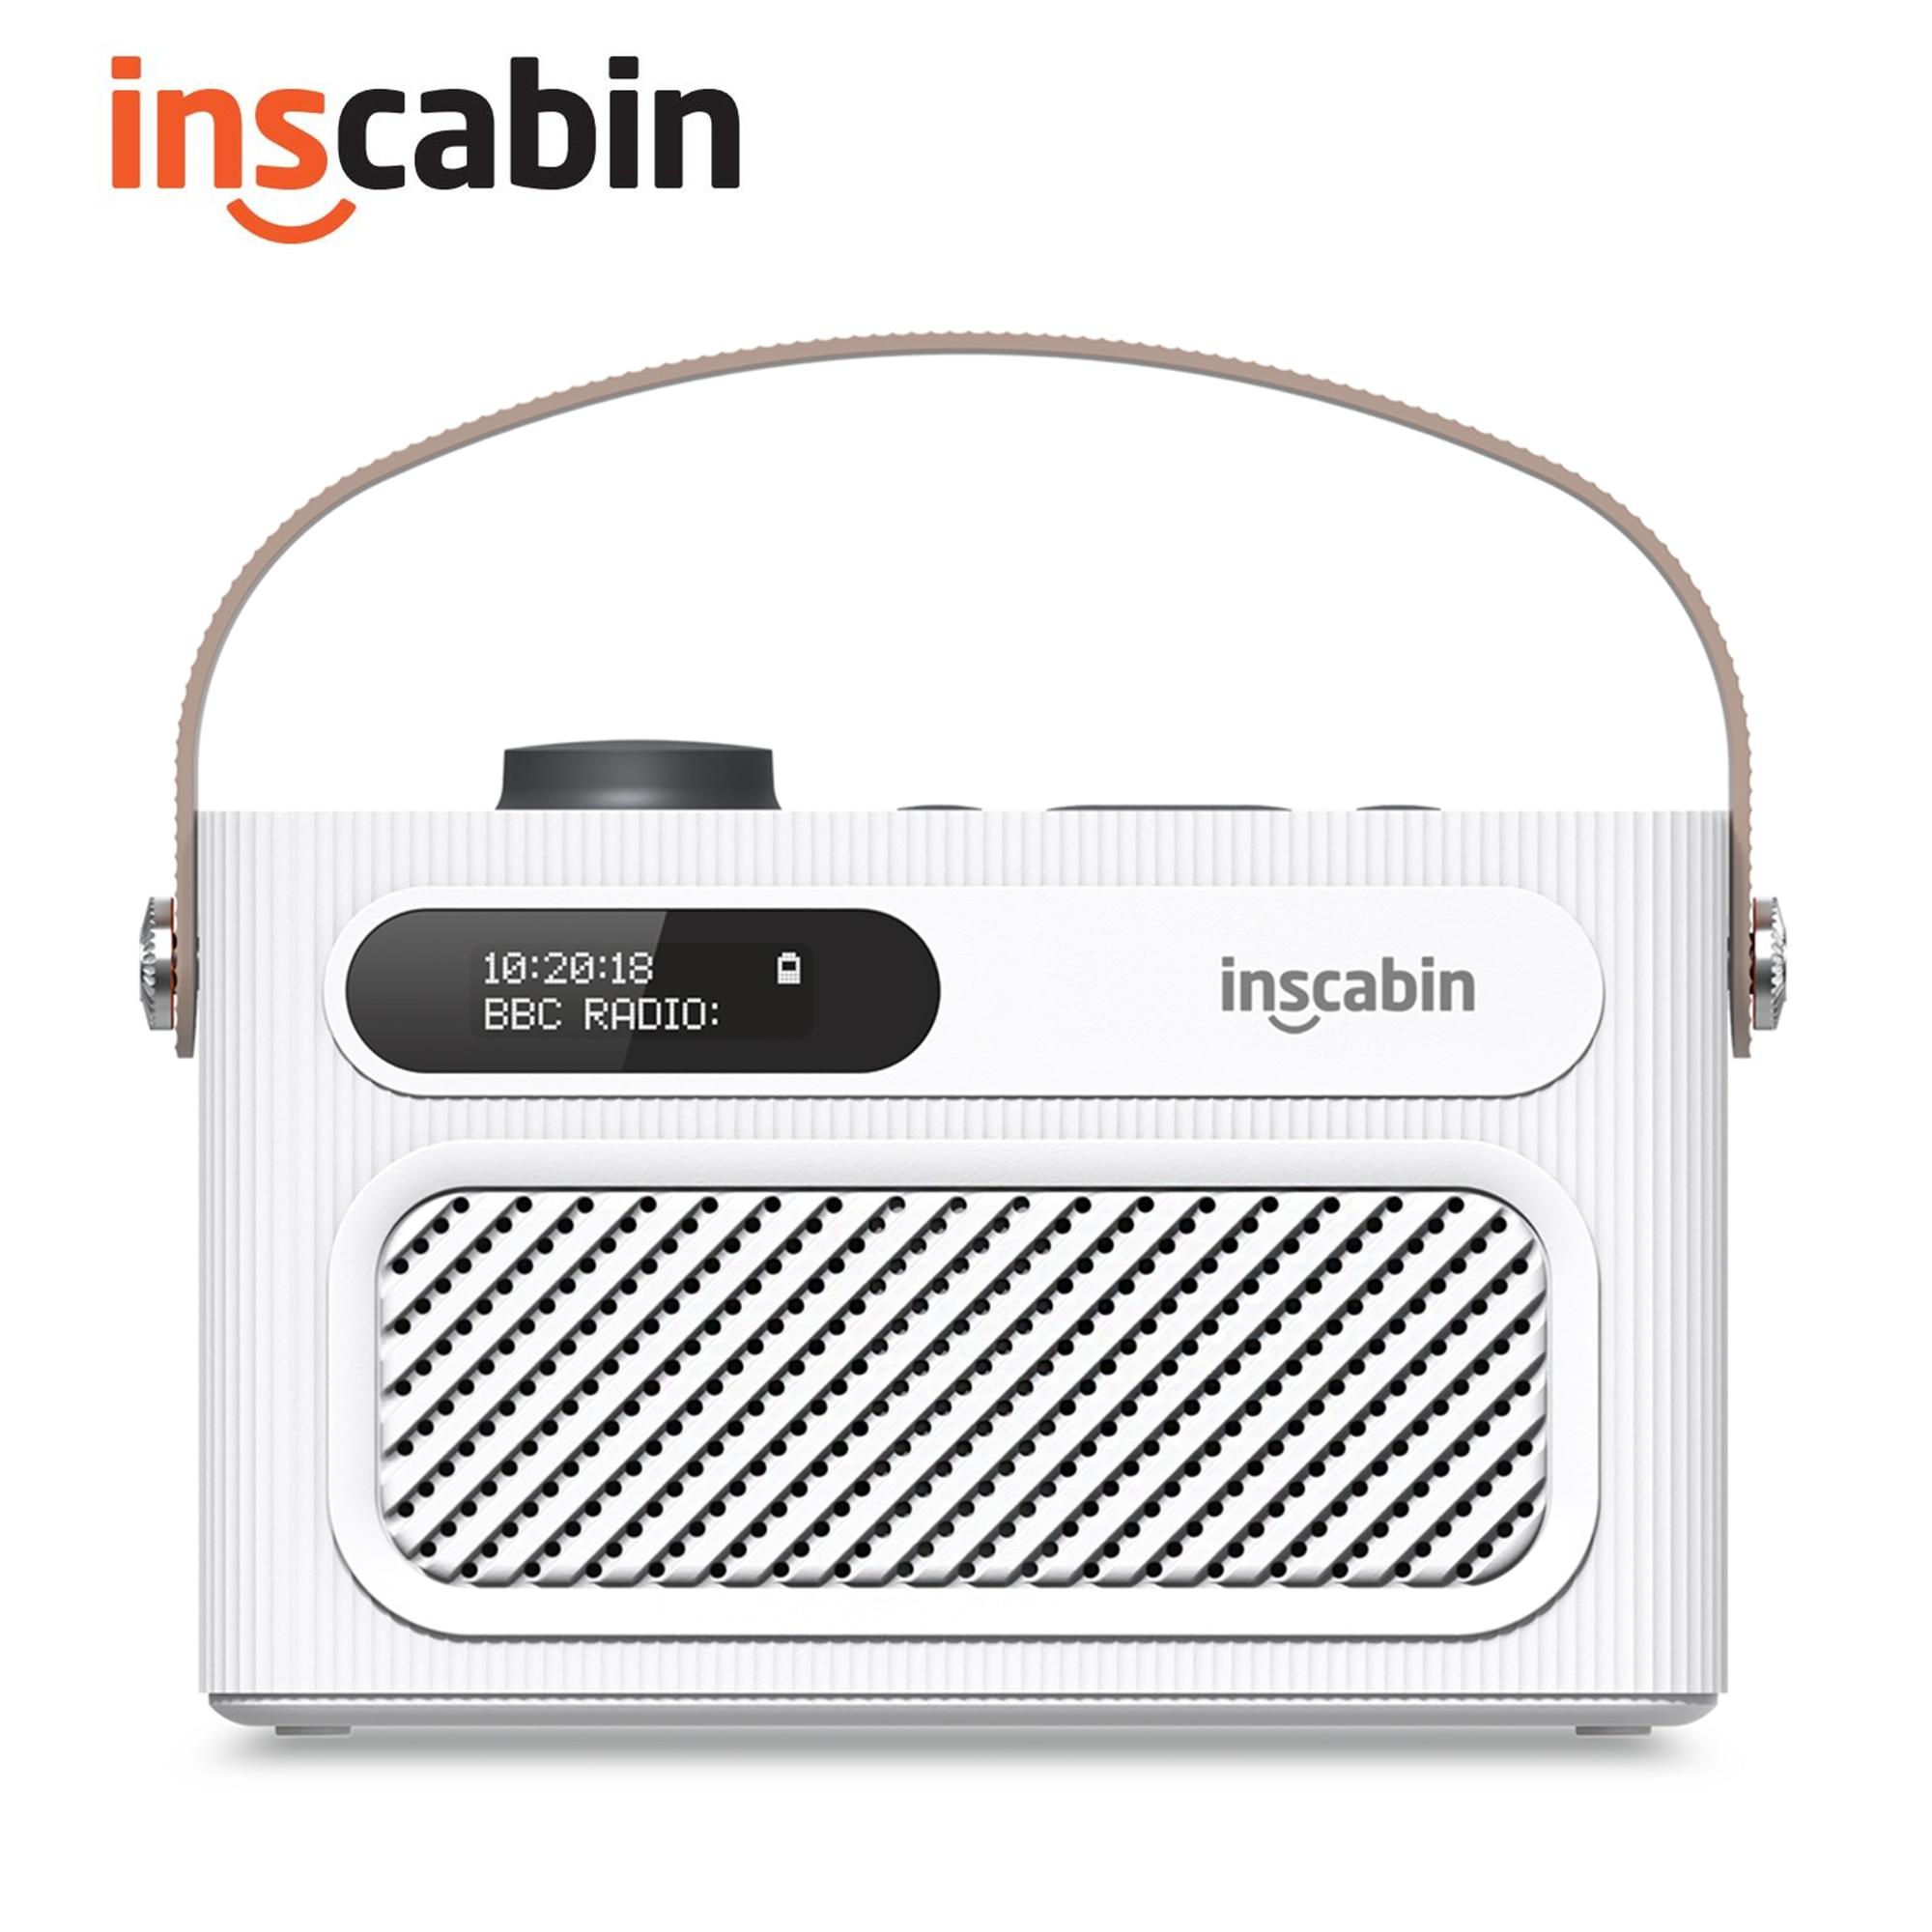 Inscabin-مكبر صوت لاسلكي محمول مع راديو DAB ، ستيريو M60 ، بلوتوث ، DAB ، FM